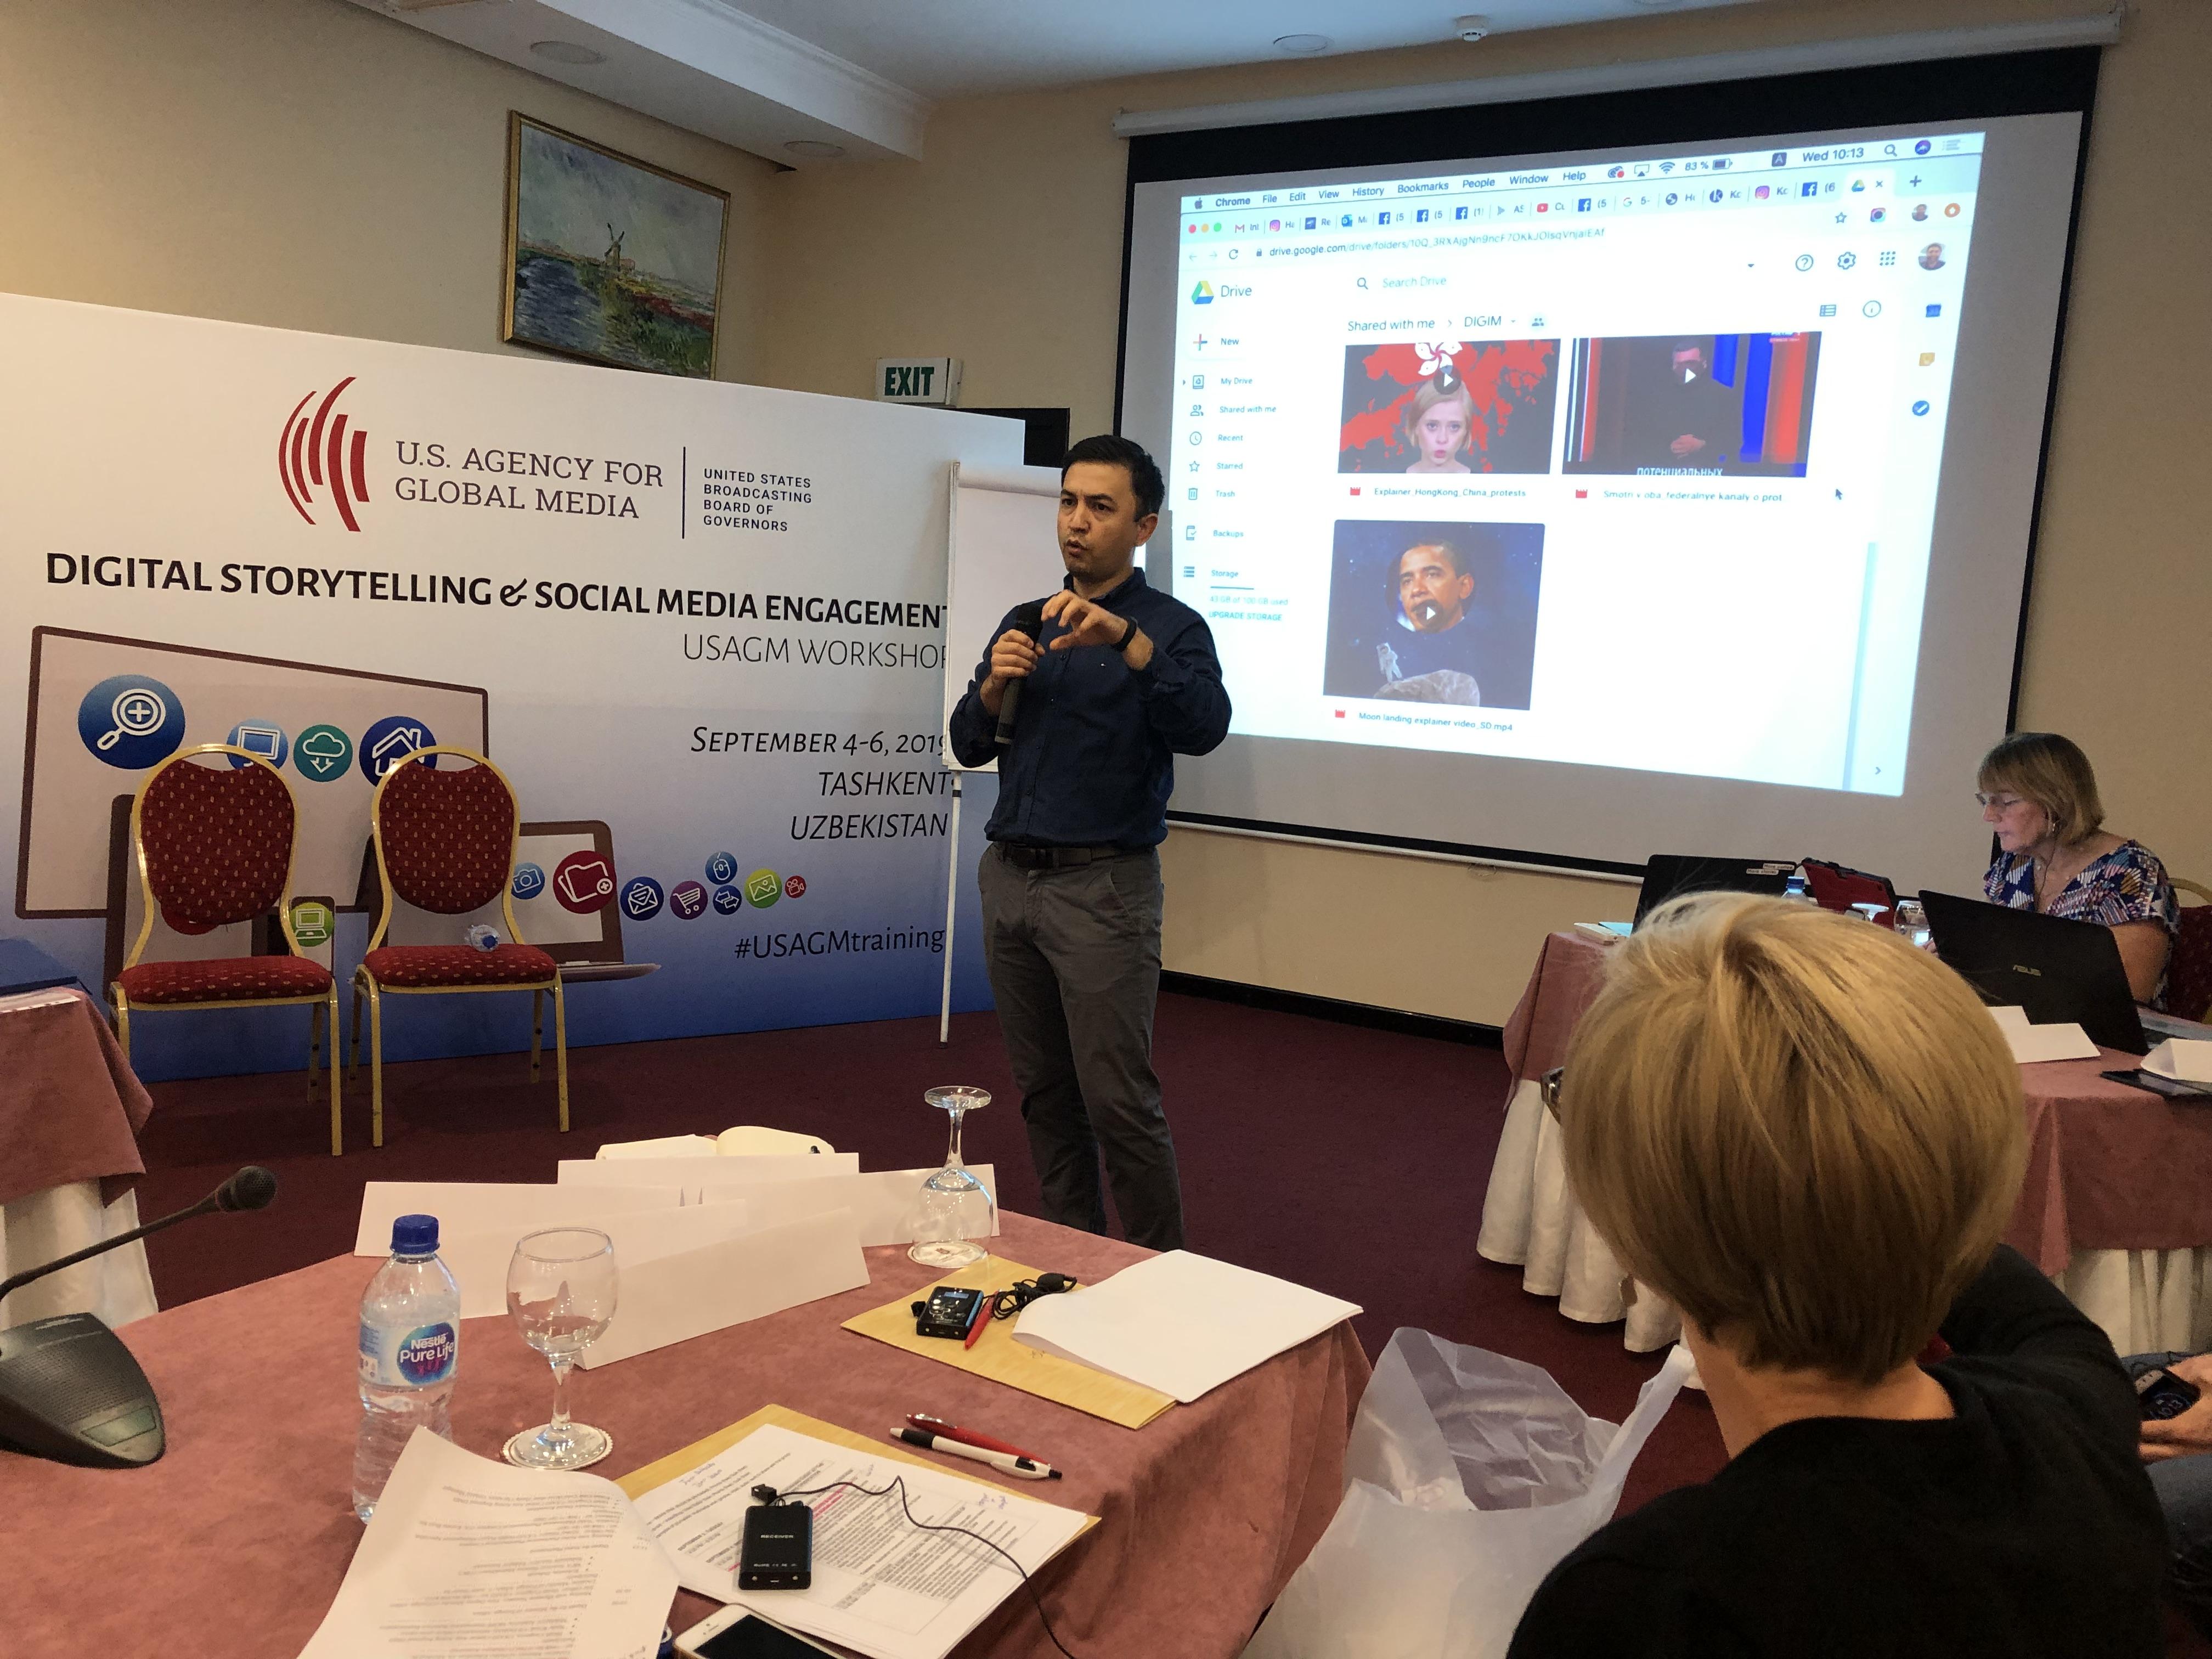 Uzbekistan: Digital Storytelling & Social media Engagement